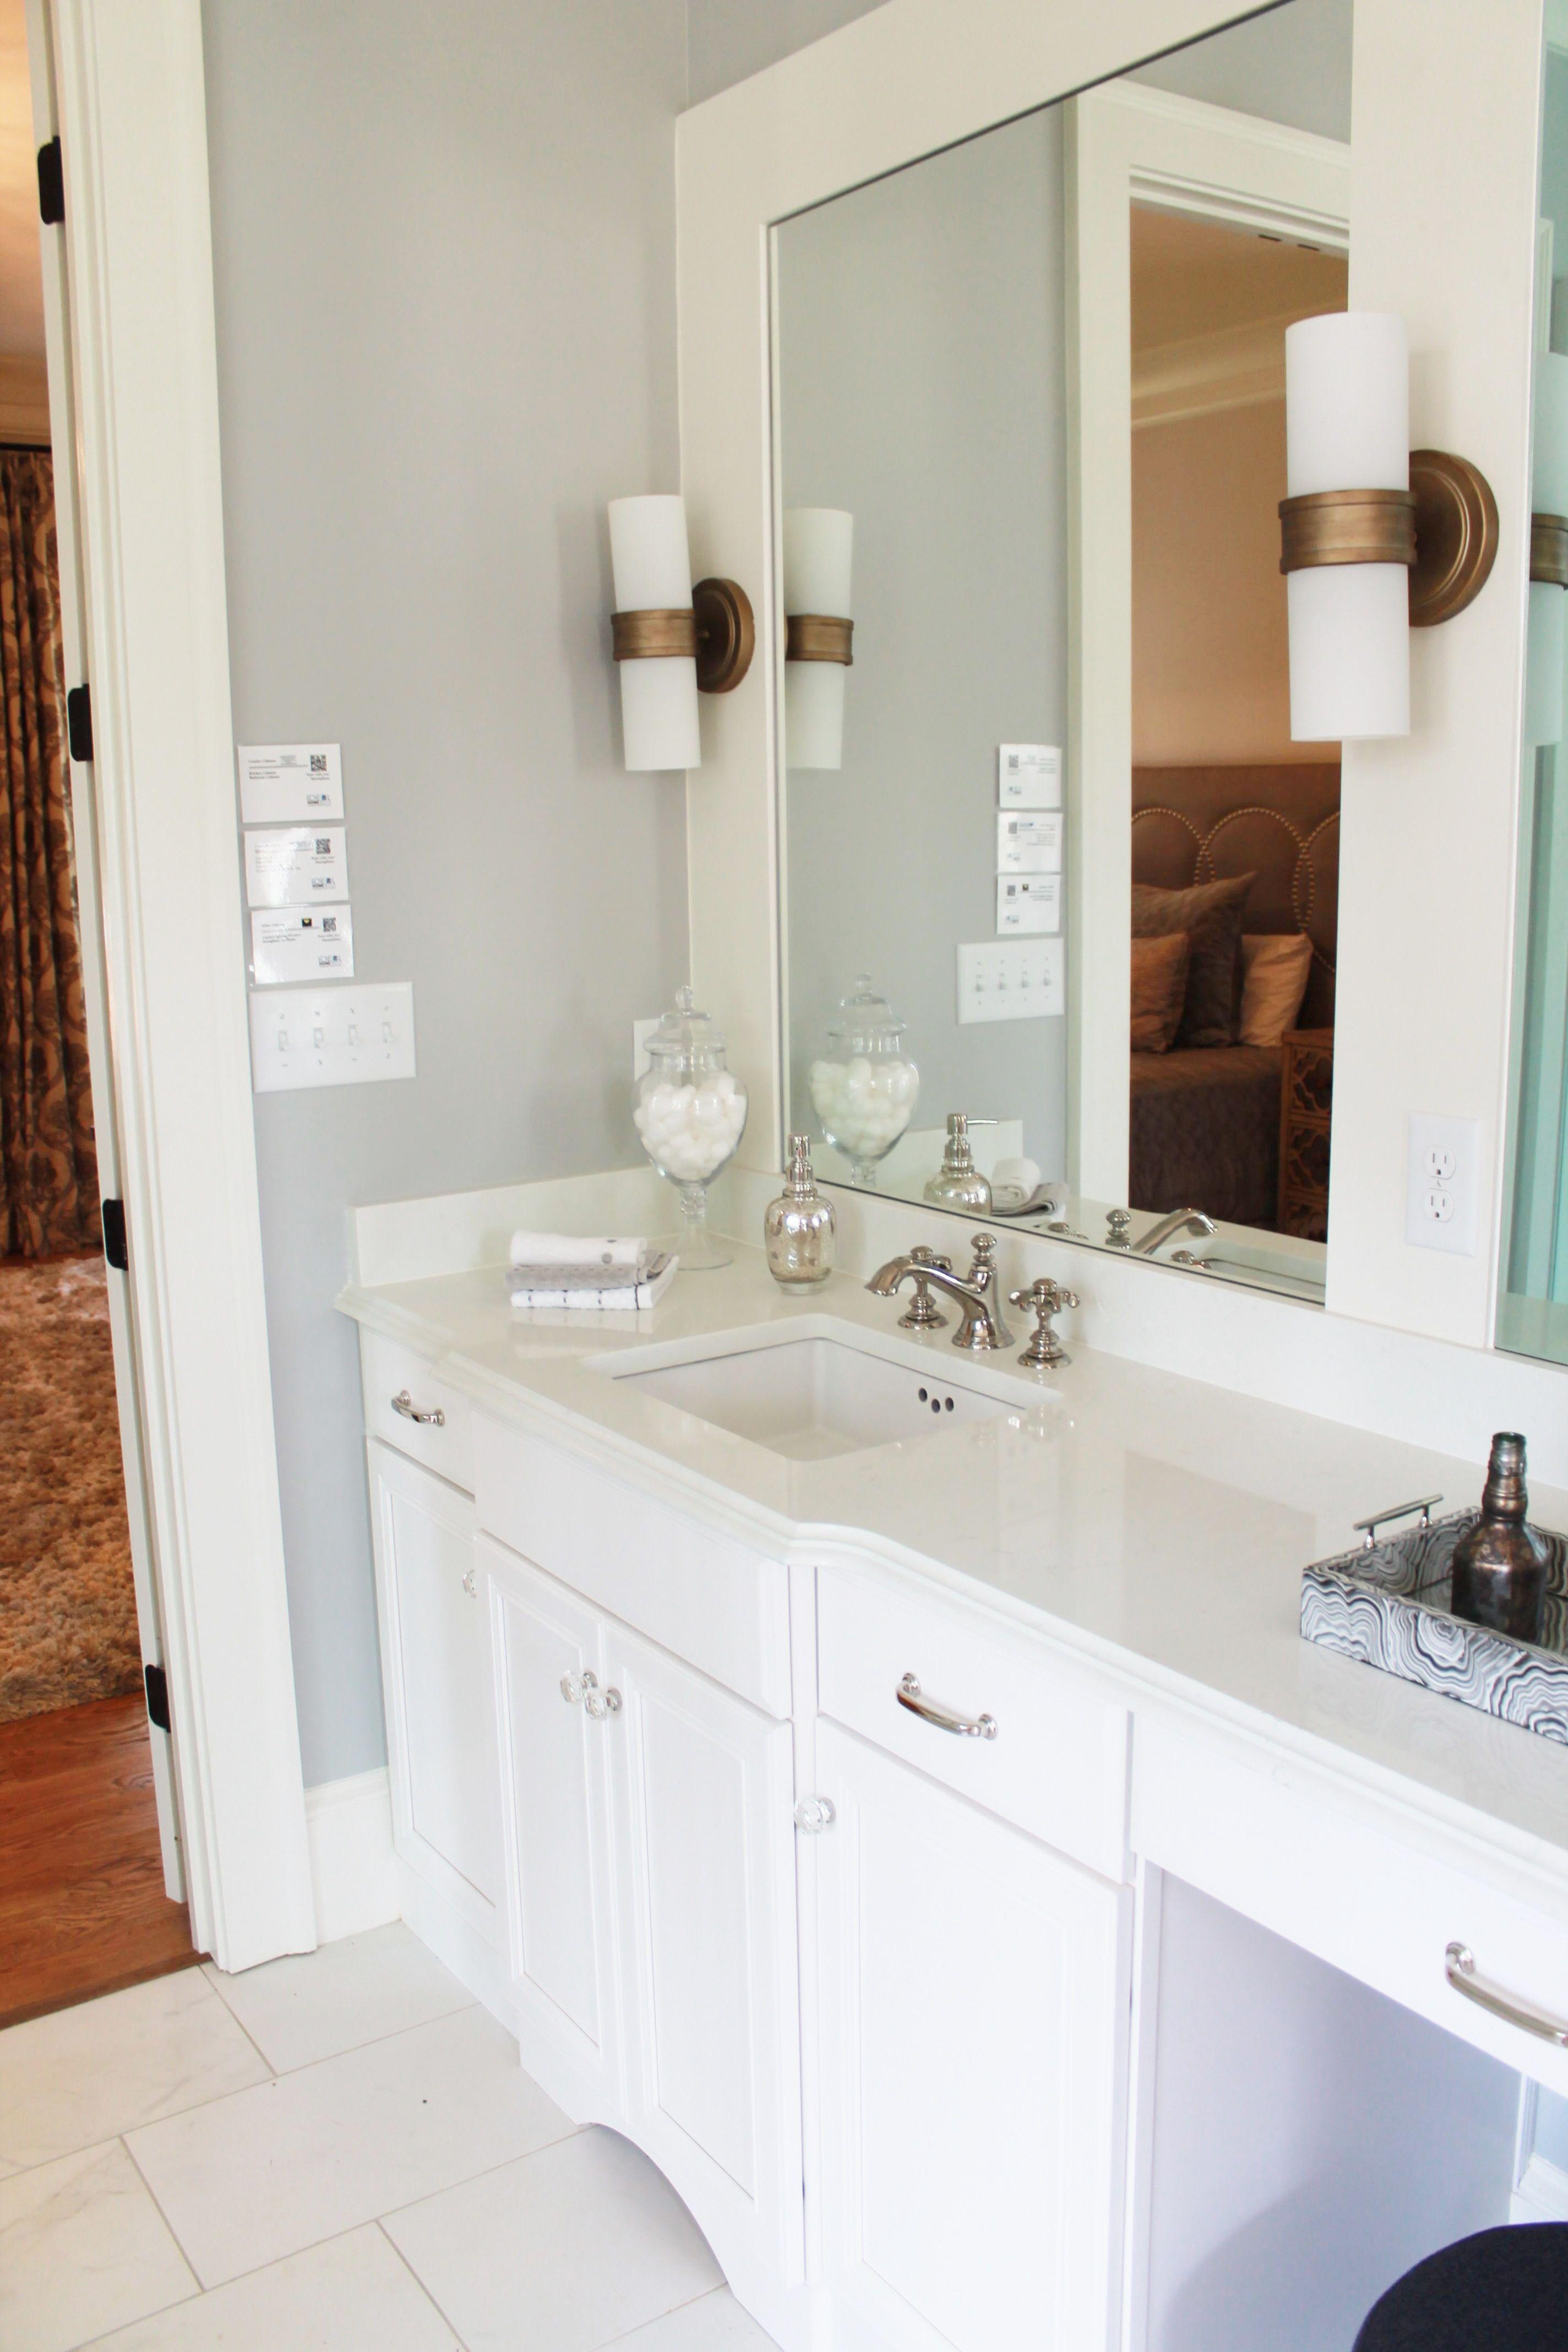 Bathroom Design Birmingham - Ariel silestone quartz bathroom countertops in 2015 gbahb ideal home installed by surface one of birmingham